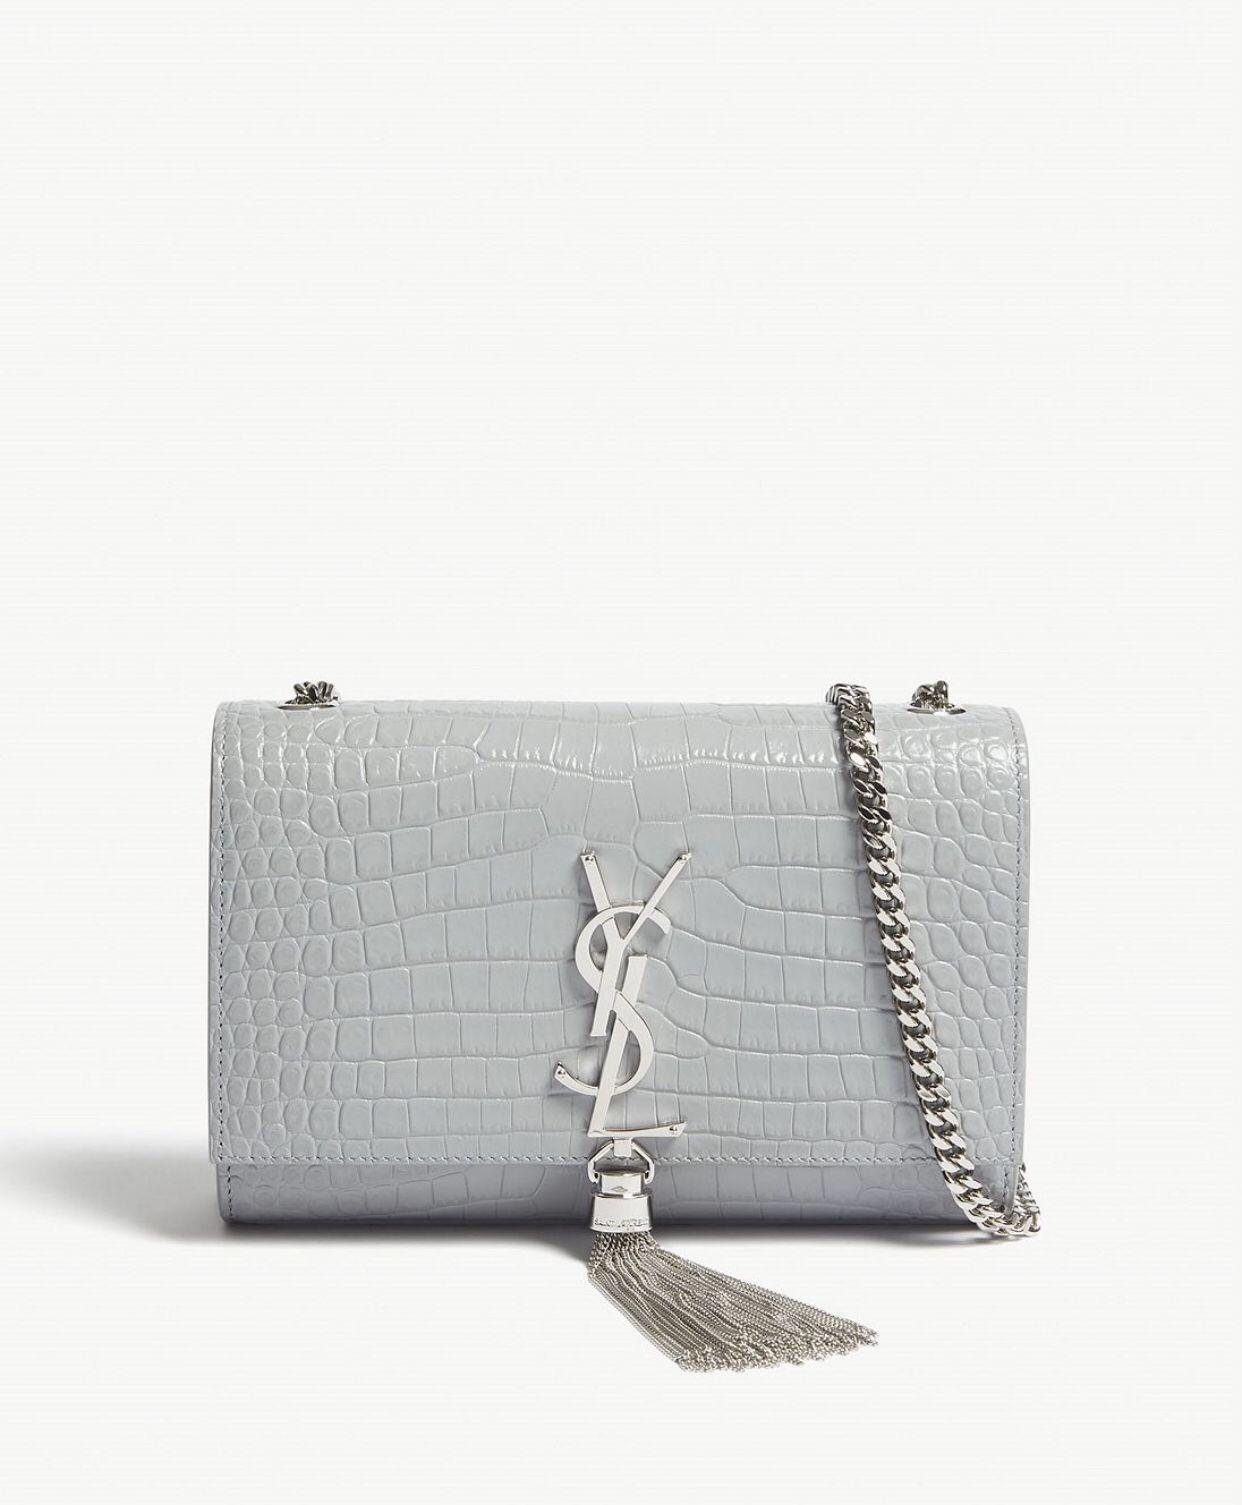 Kate small tassel croc embossed leather shoulder bag-cloud  37d910b786d8a